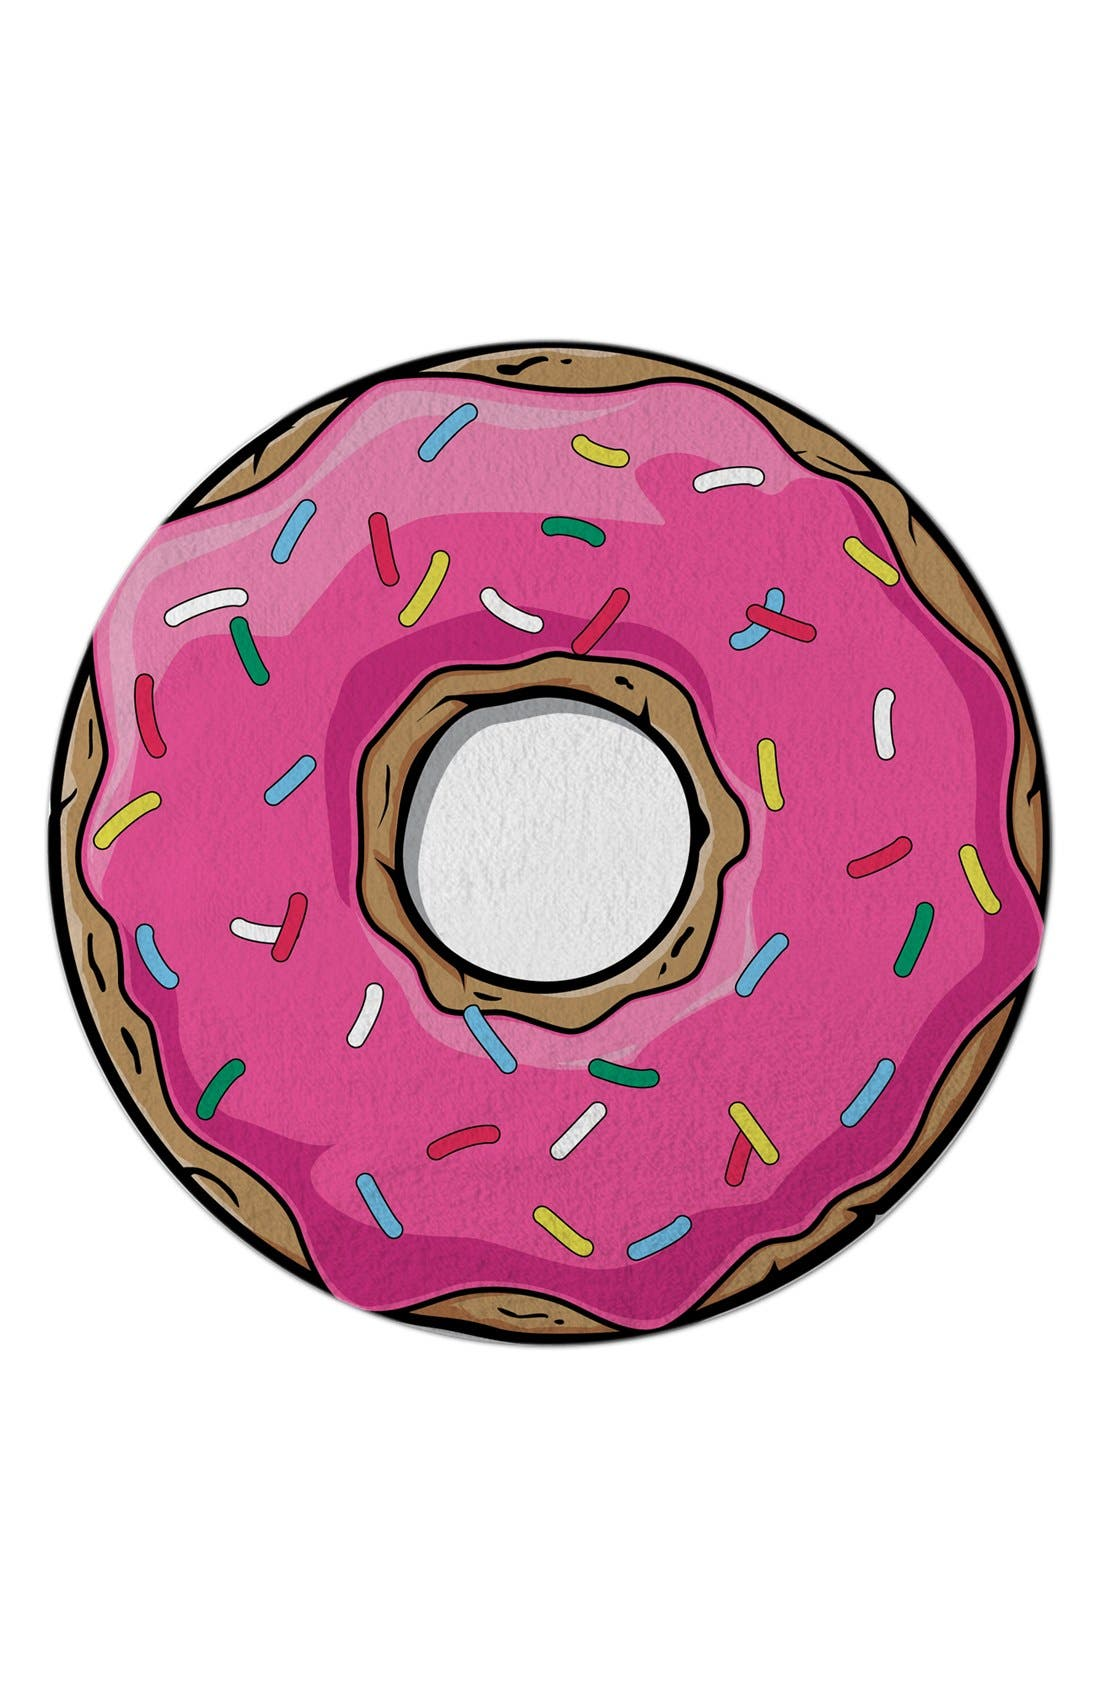 Main Image - Round Towel Co. Donut Round Beach Towel